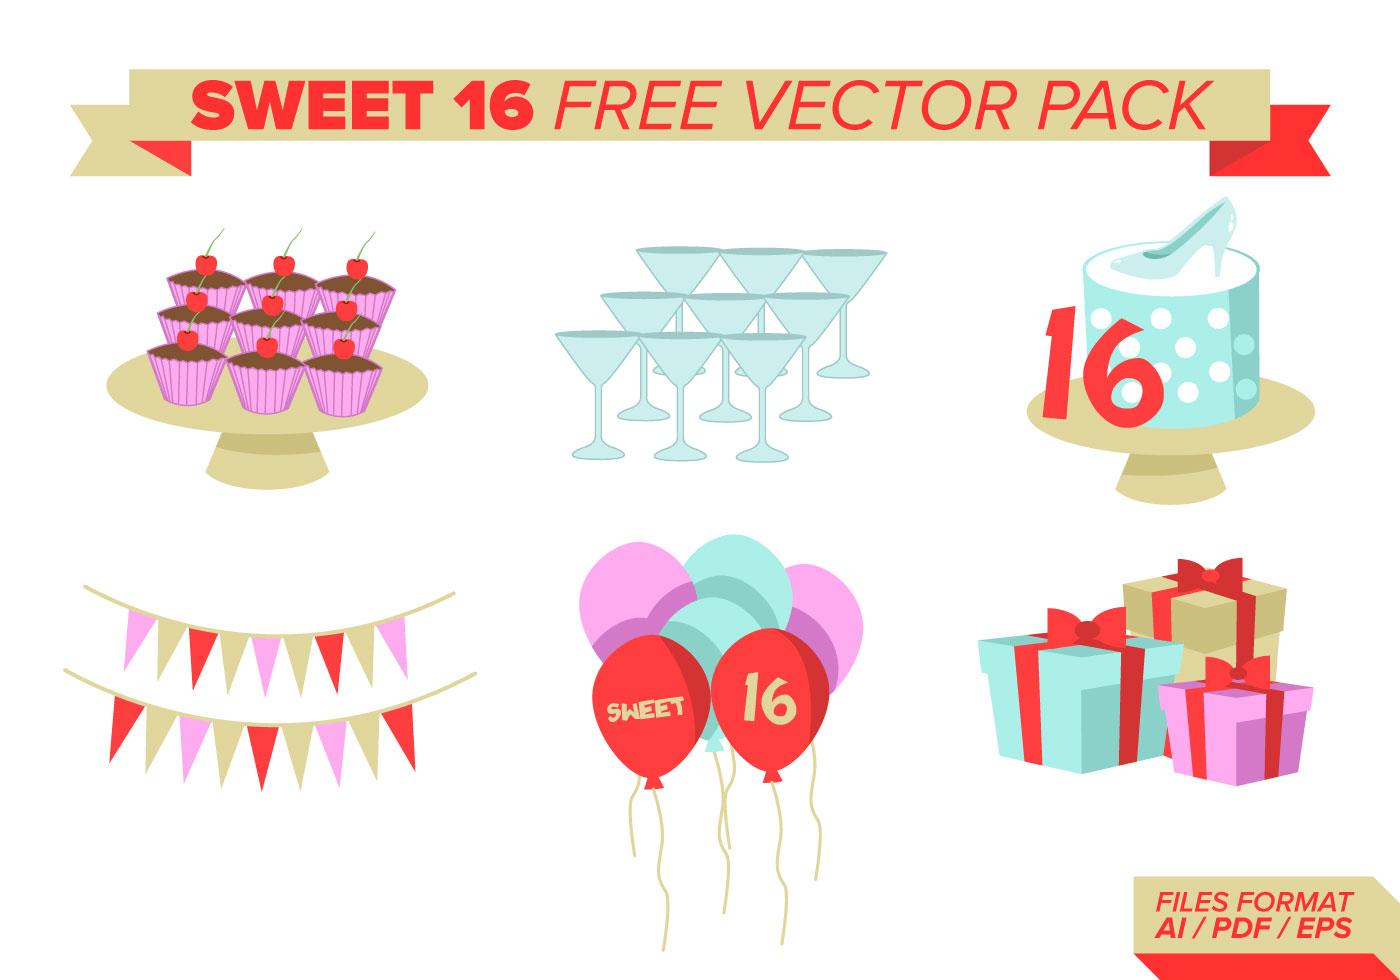 Sweet 16 Free Vector Pack Download Free Vector Art